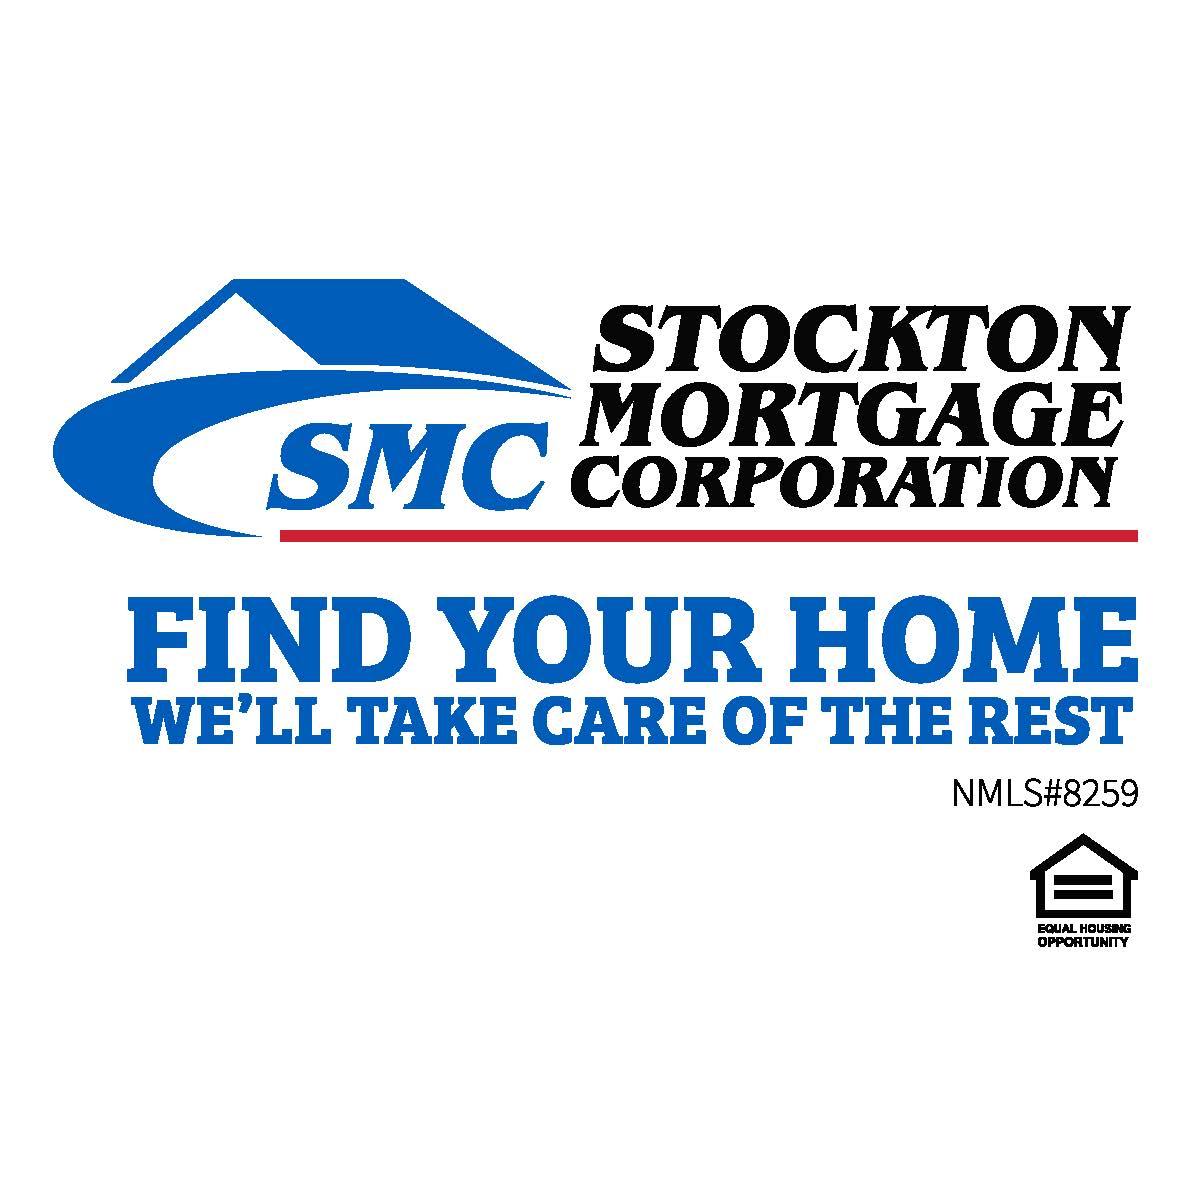 Stockton Mortgage Corporation - Lexington, KY - Mortgage Brokers & Lenders